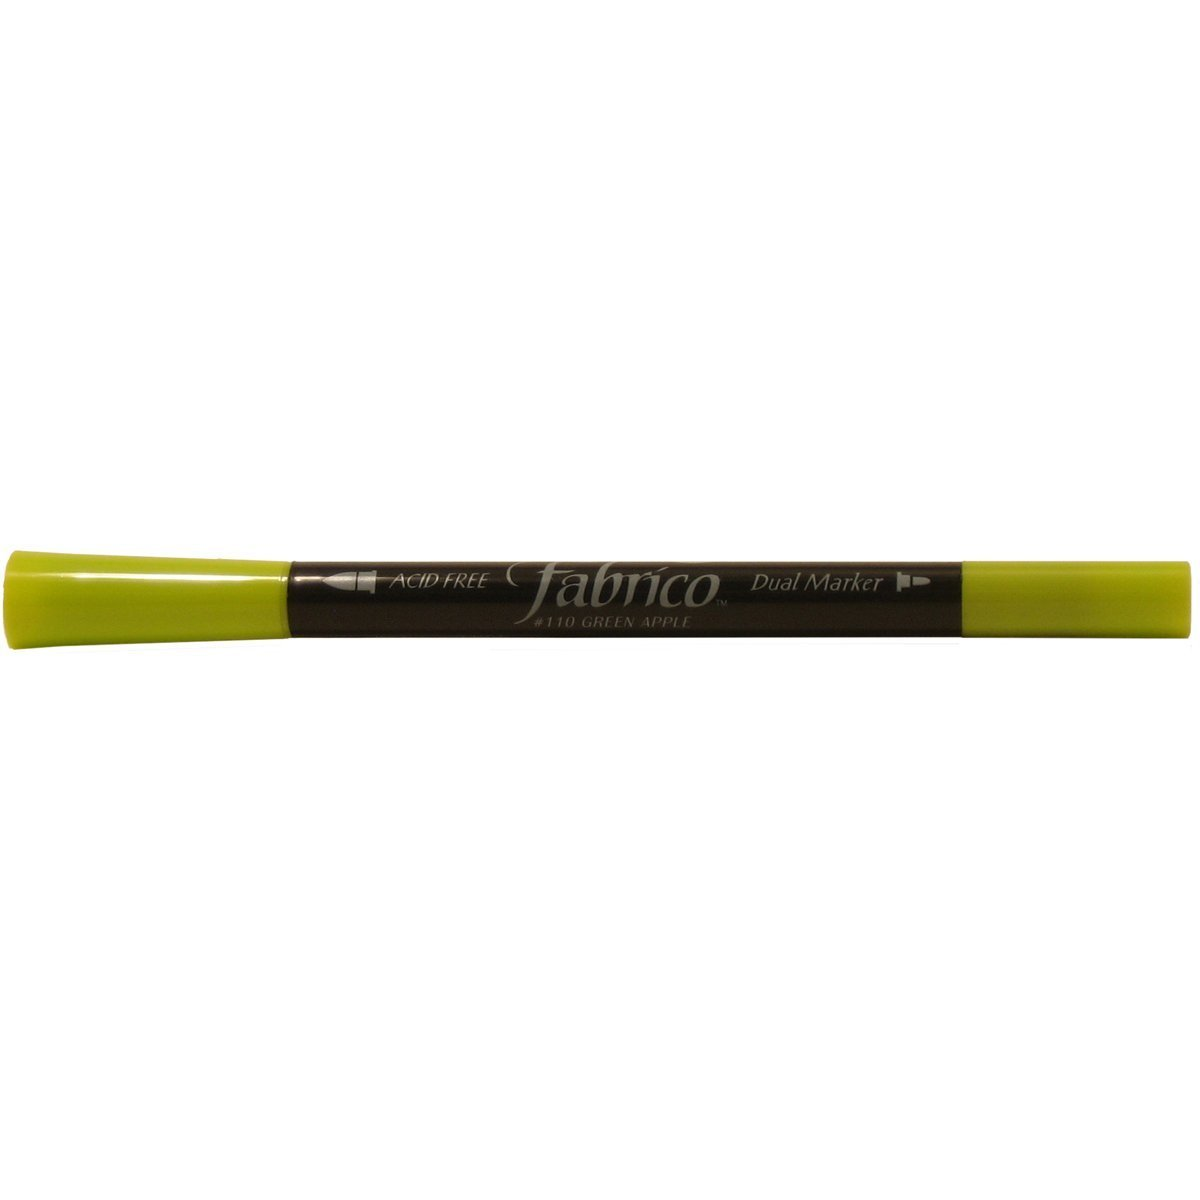 110 Green Apple - Fabrico Dual Tip Marker